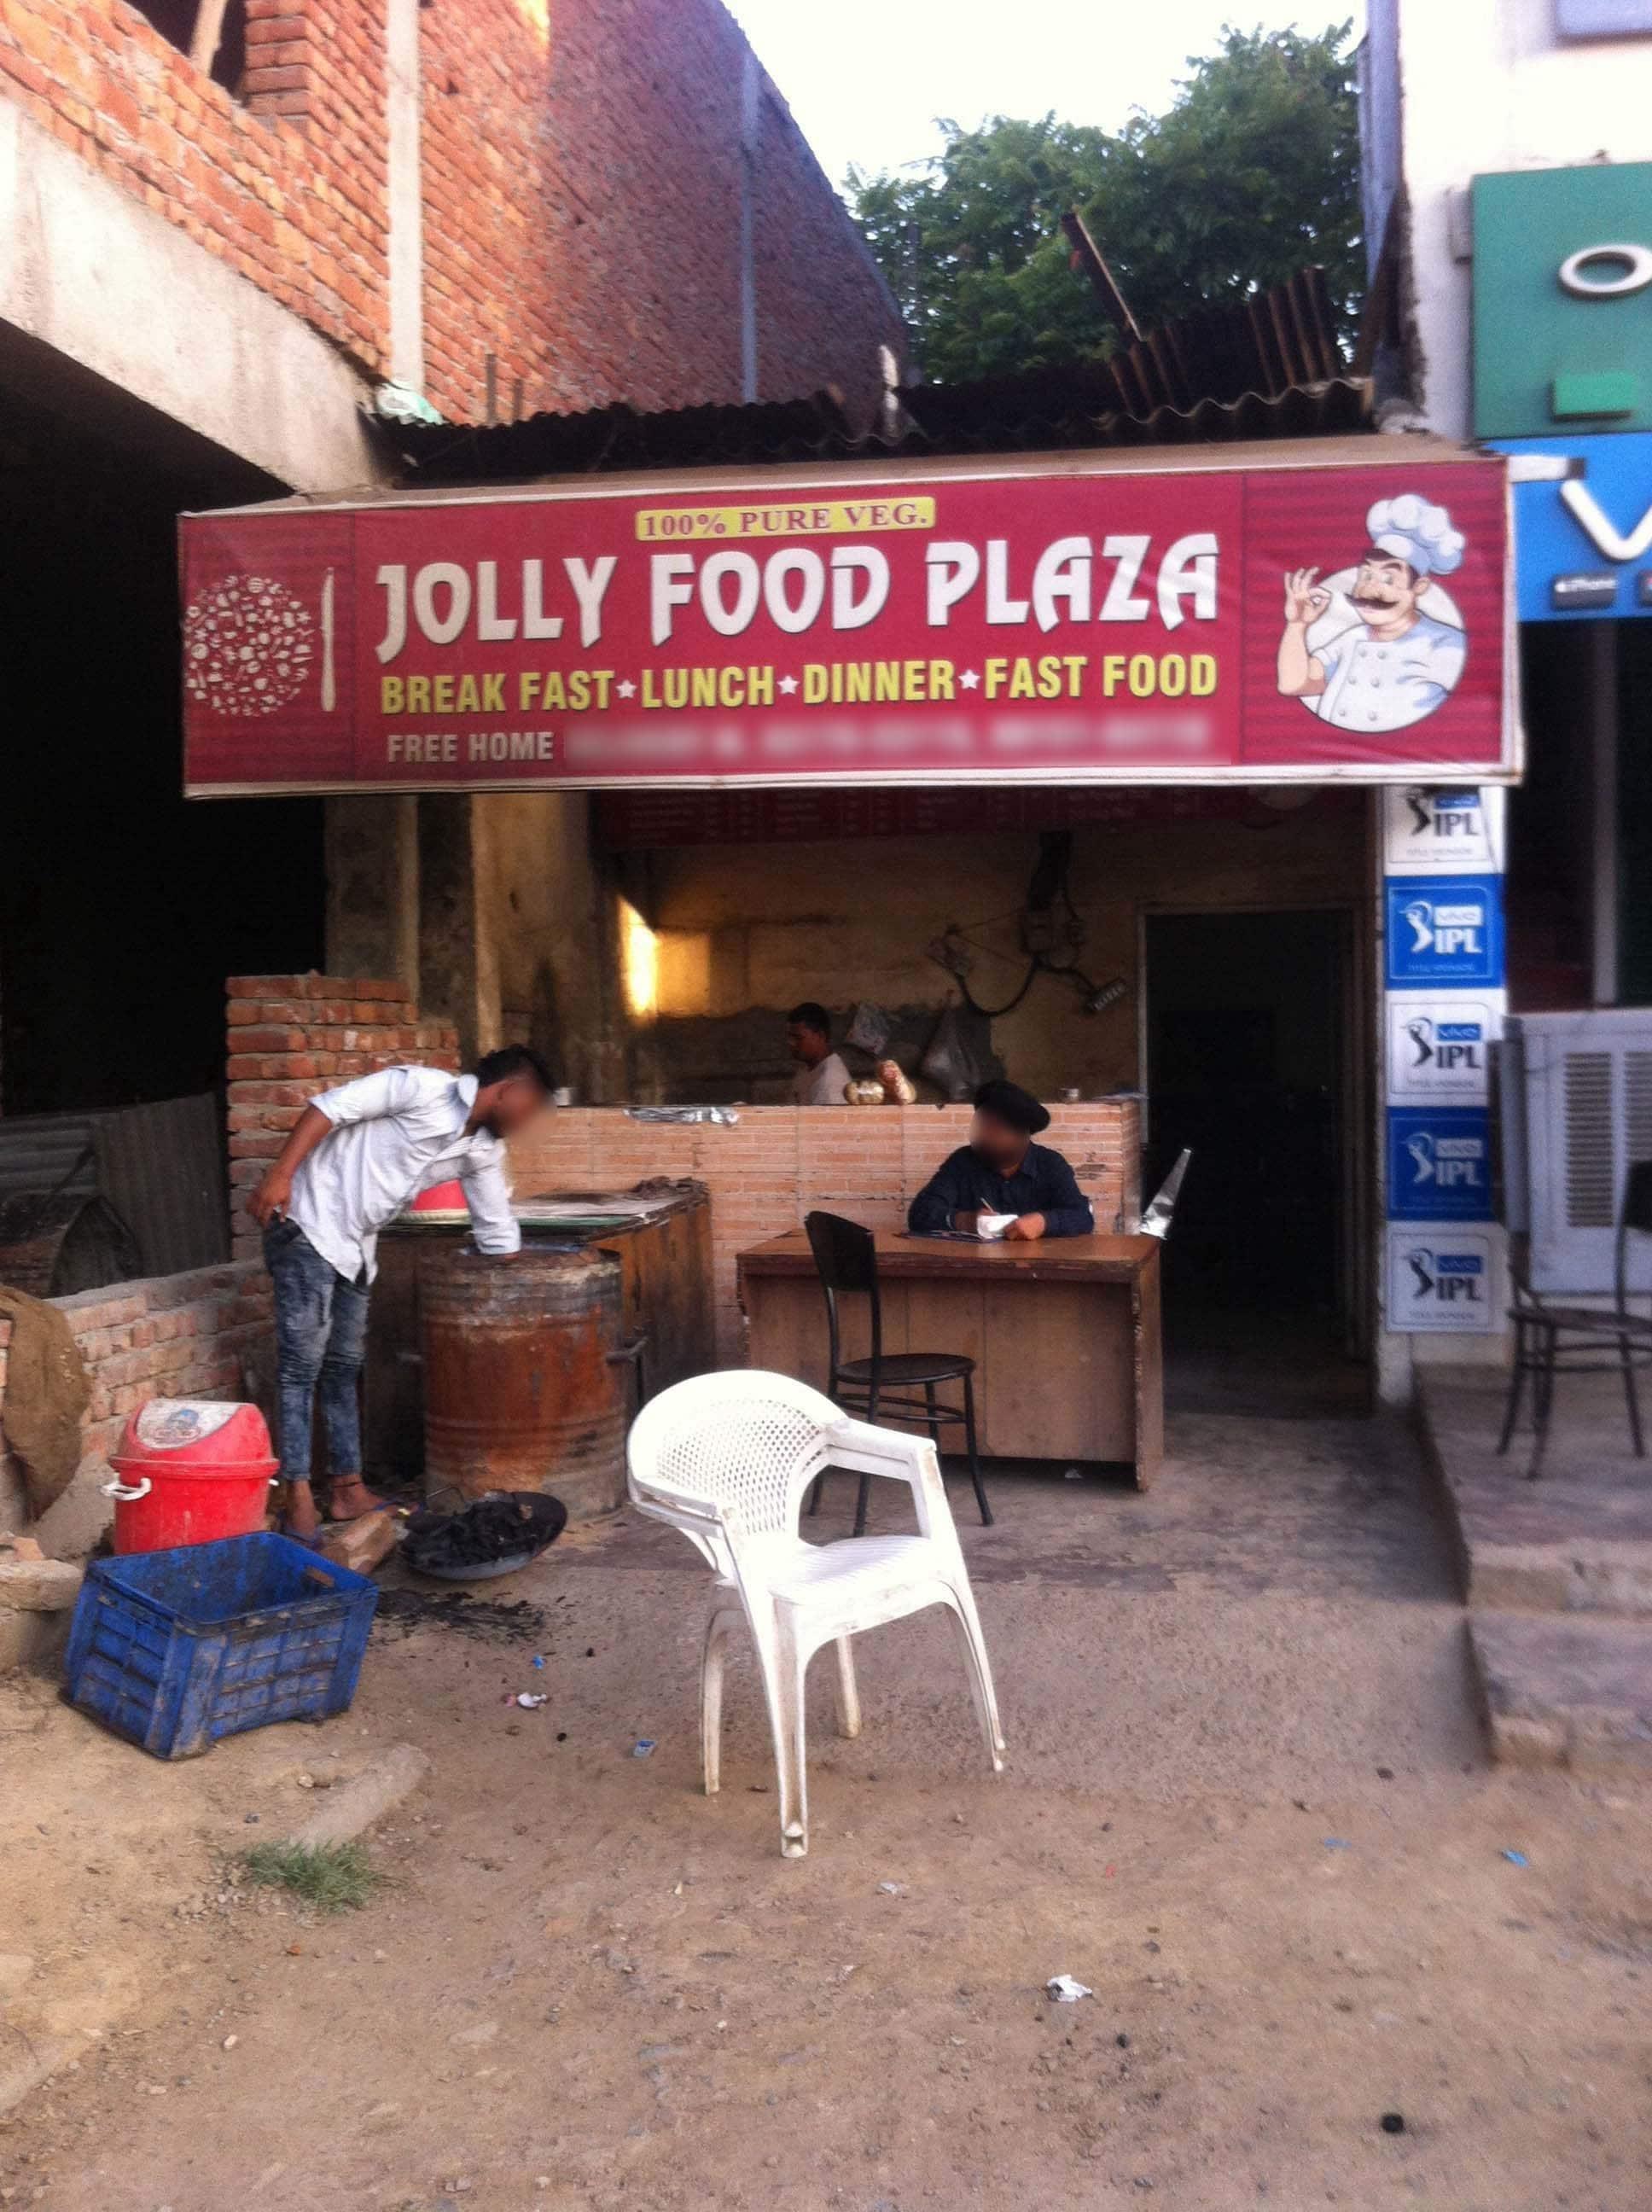 Jolly Food Plaza - Dugri - Ludhiana Image